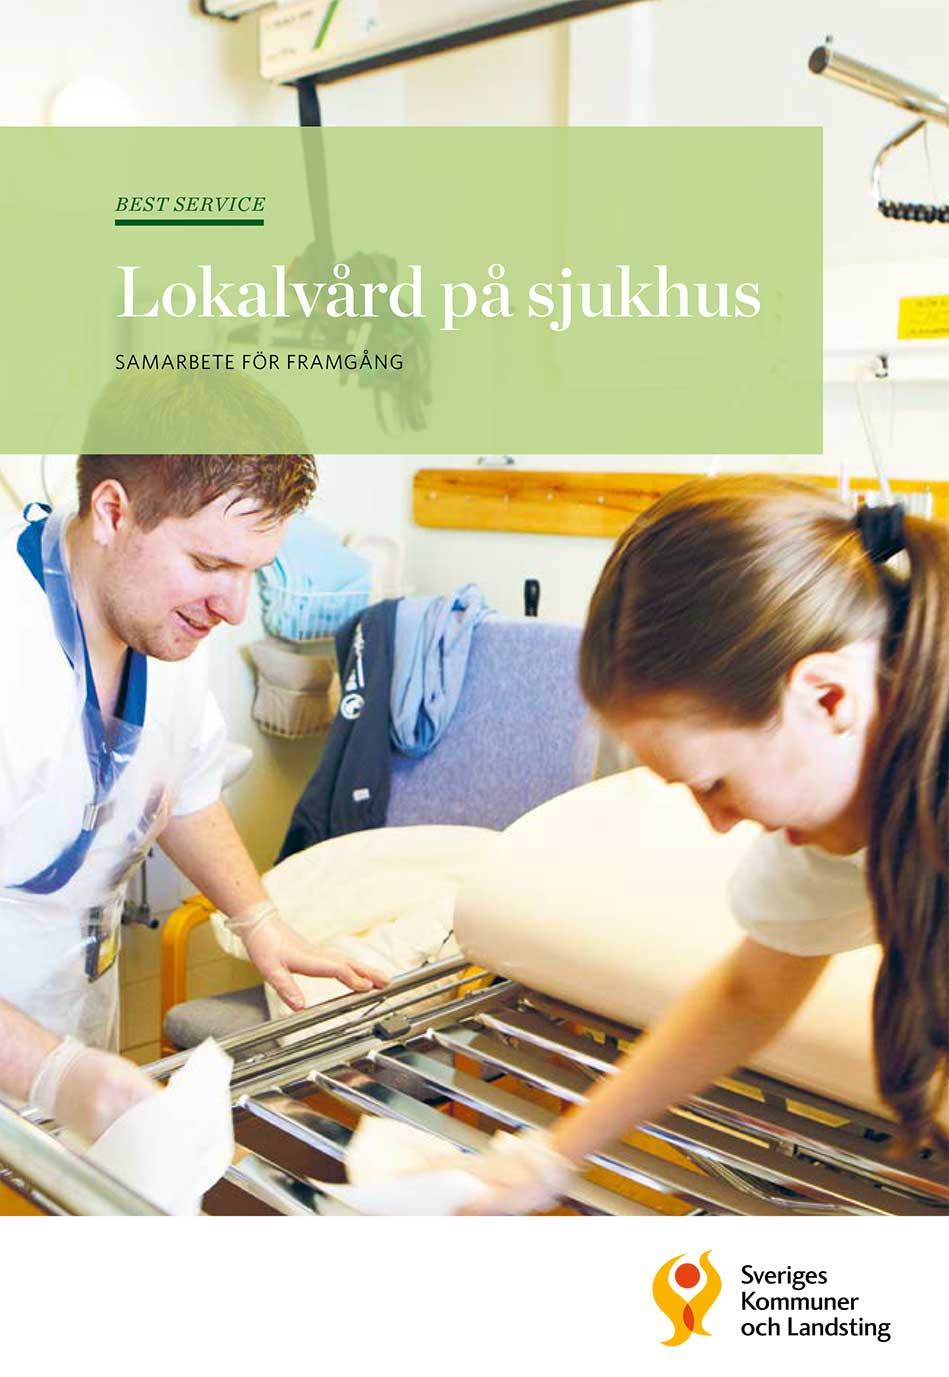 Lokalvard-pa-sjukhus-1